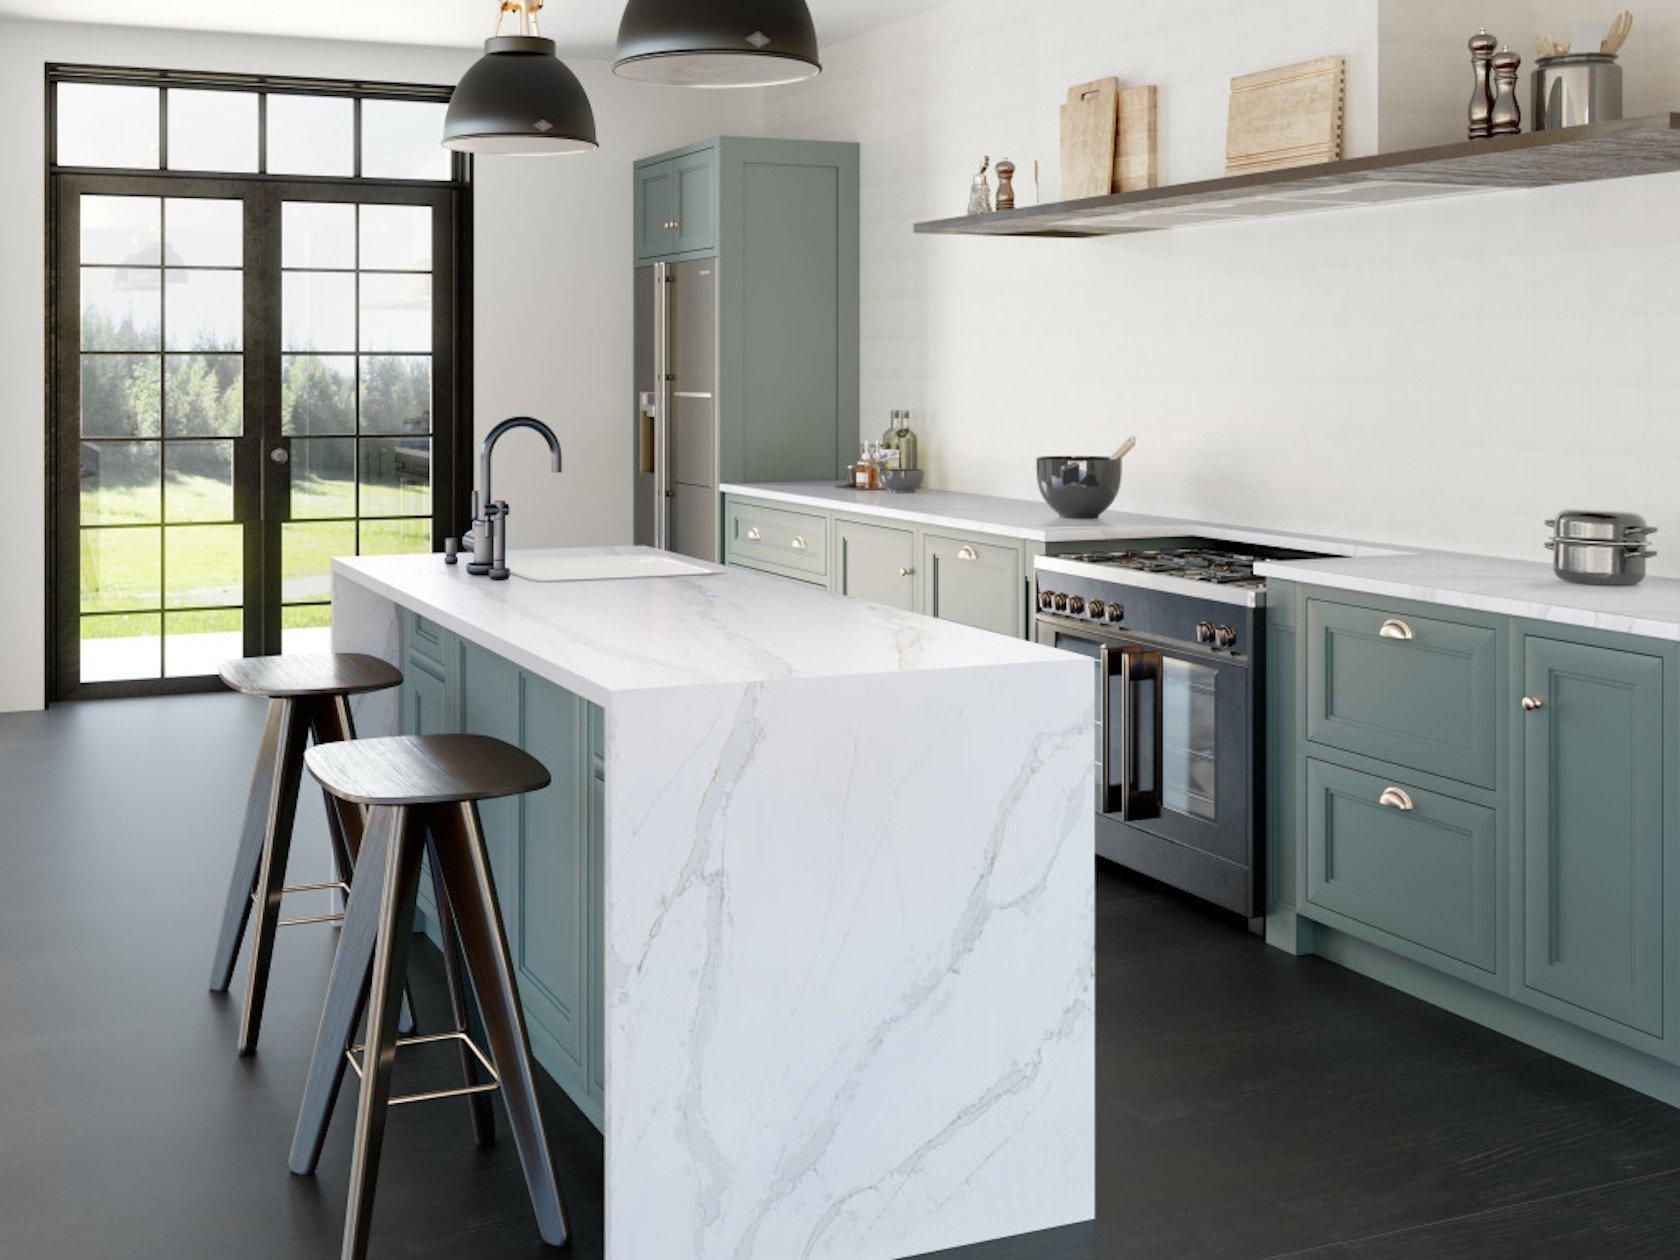 Kitchen Worktops - Four Seasons Kitchen Design Leeds